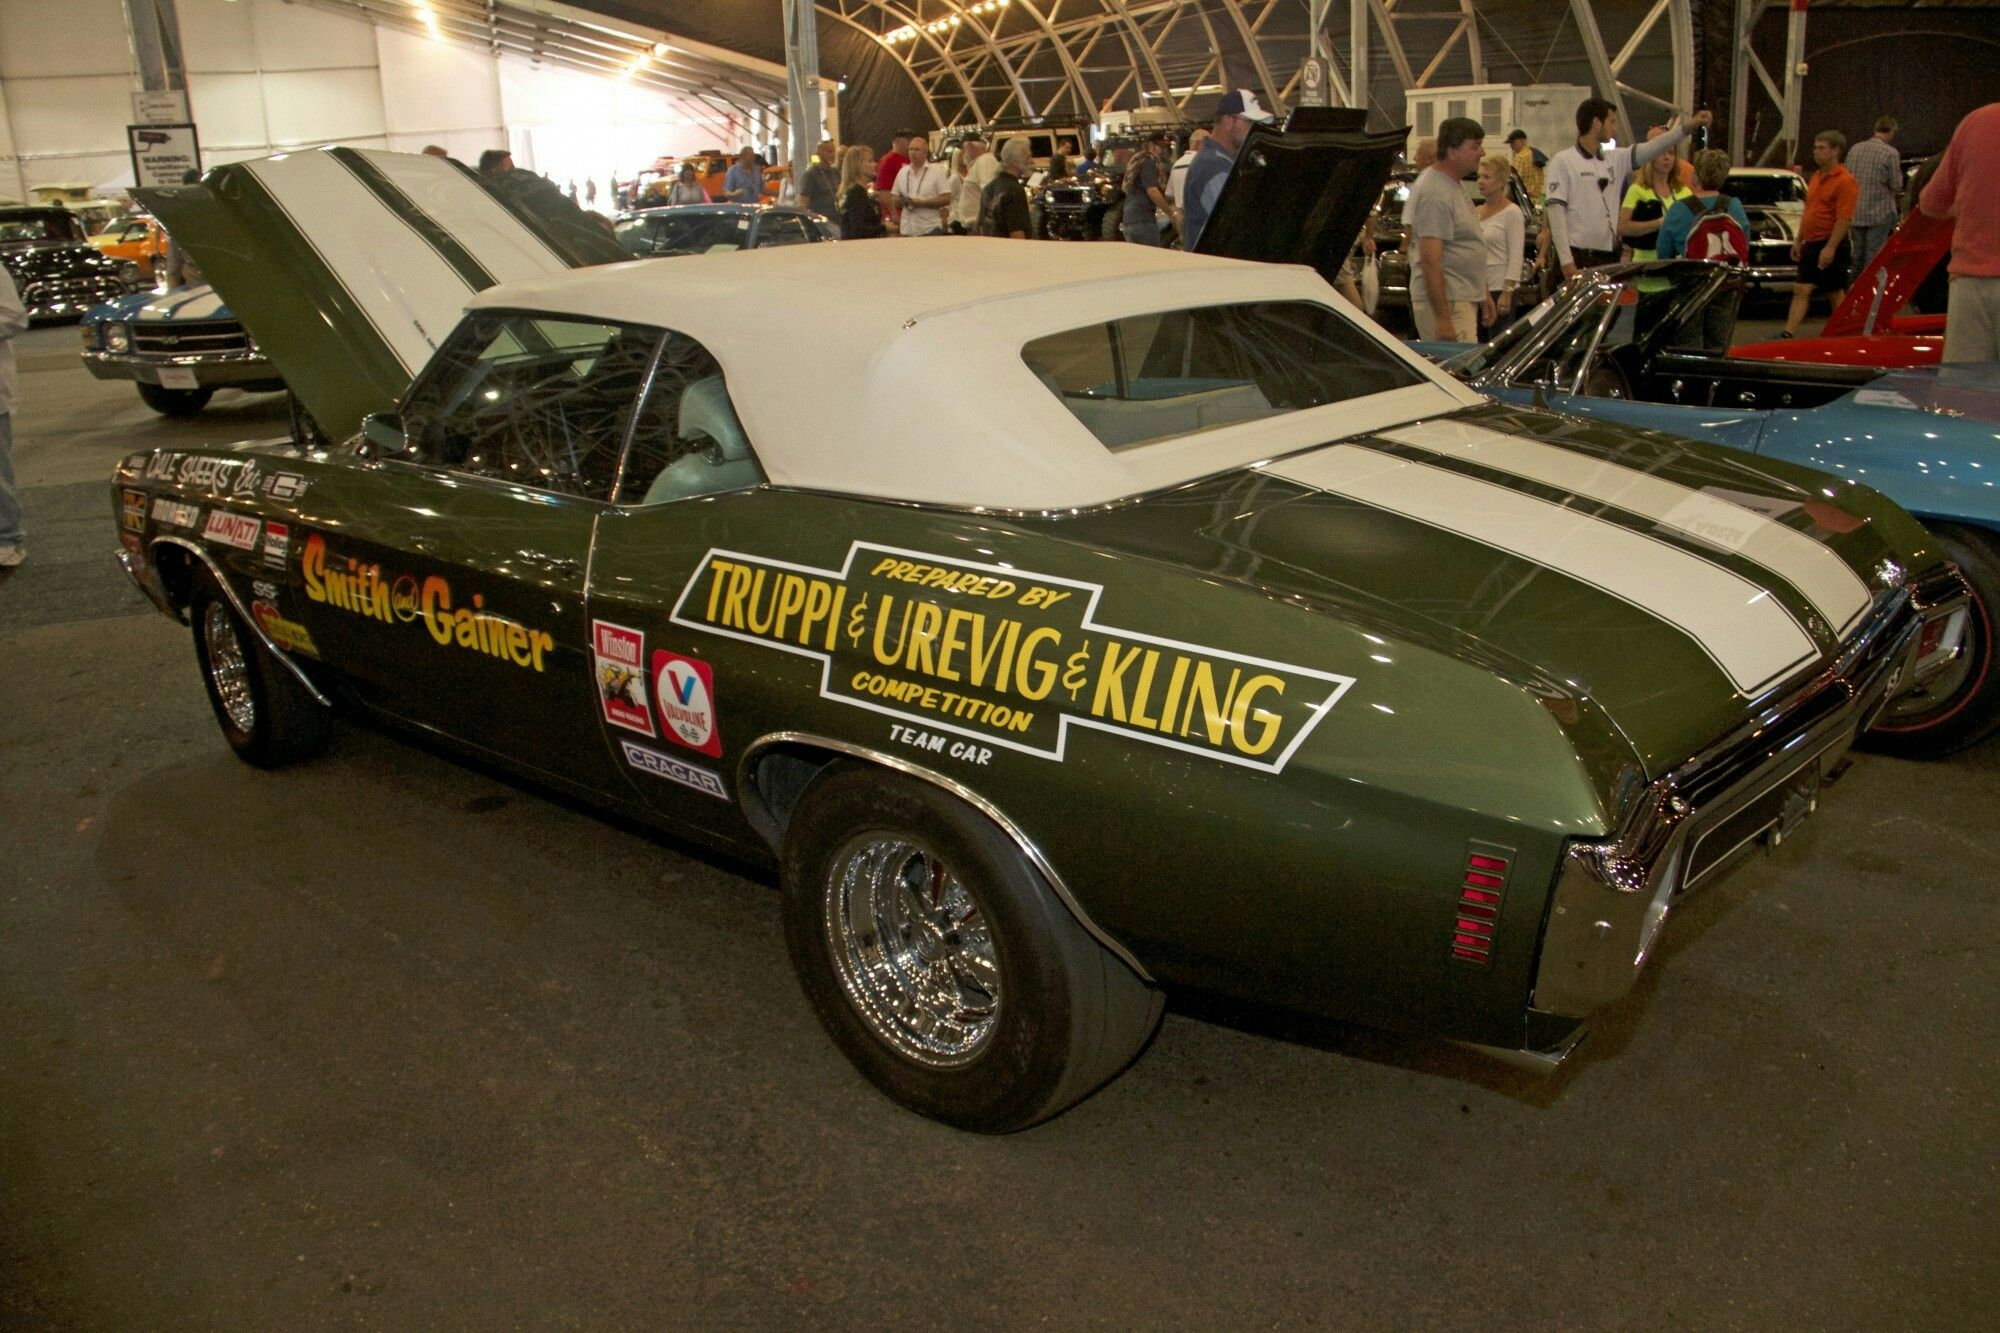 1969 cougar classic car restoration by doug jenkins garage - Claude Urevigs Truppi Kling Chevelle